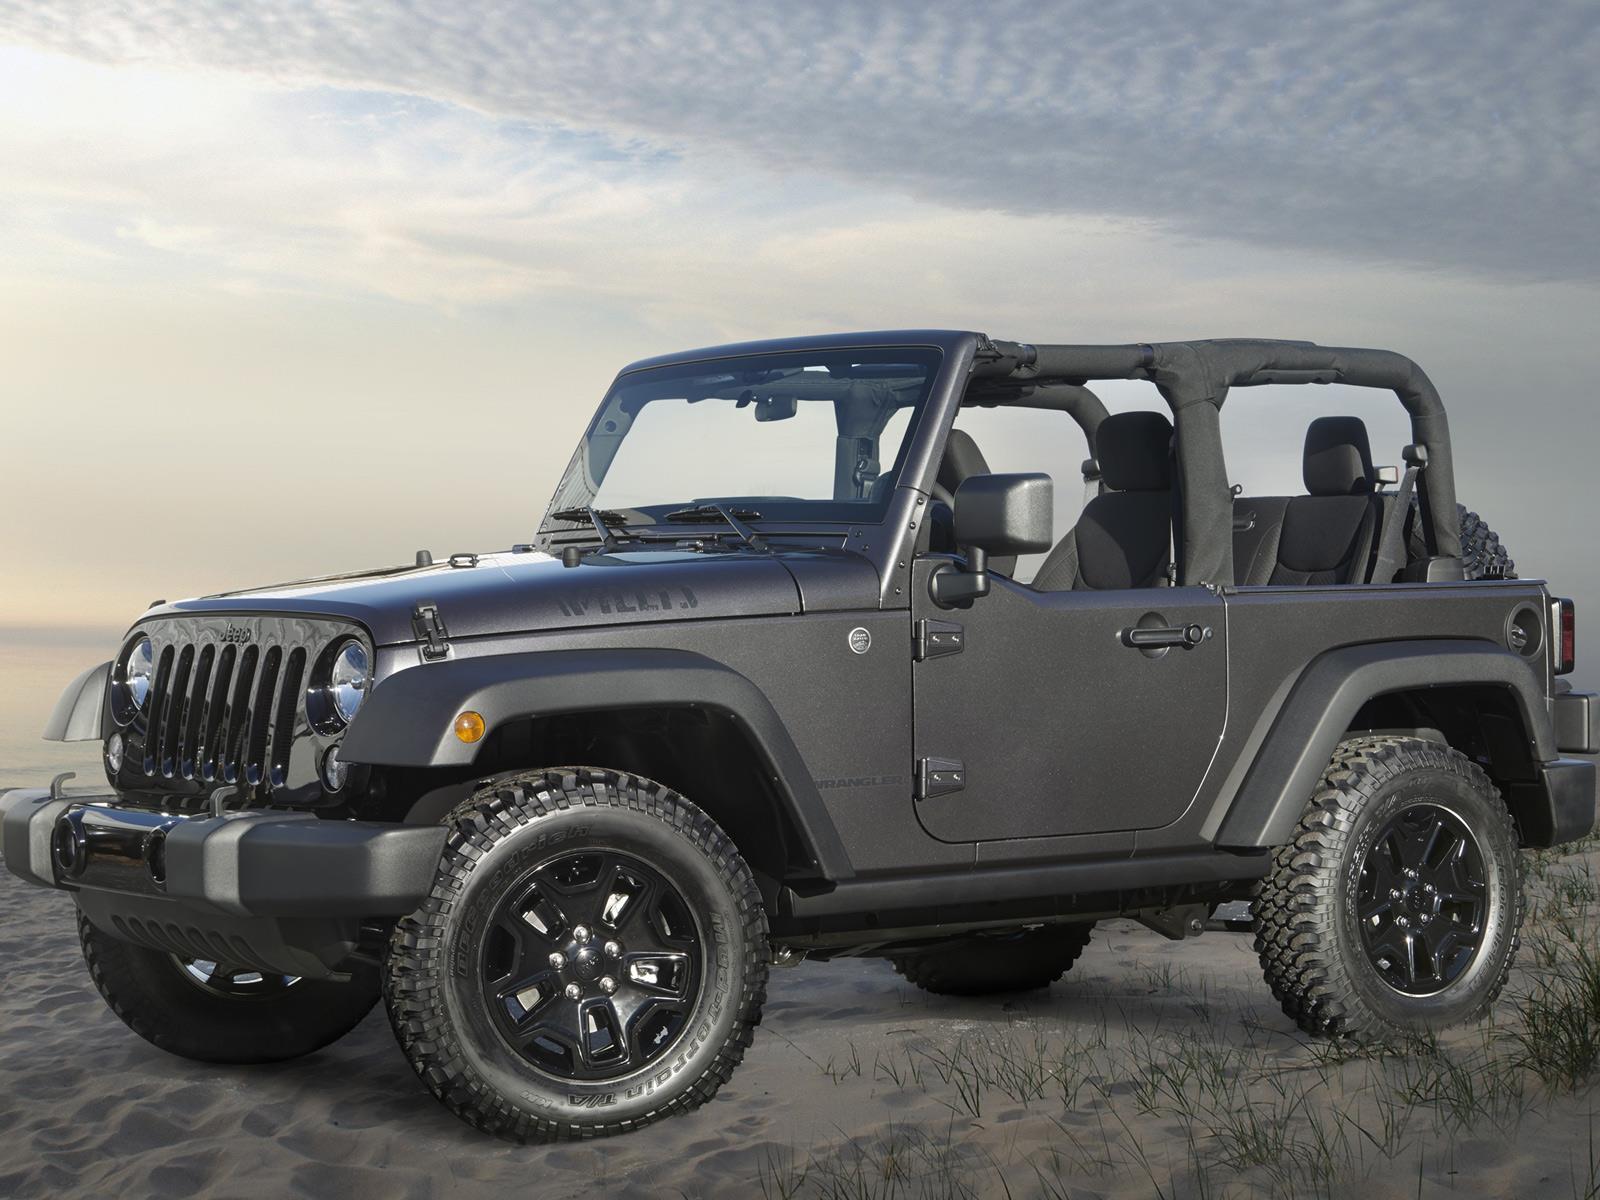 sal n de los ngeles 2013 jeep wrangler edici n willys wheeler se presenta noticias. Black Bedroom Furniture Sets. Home Design Ideas